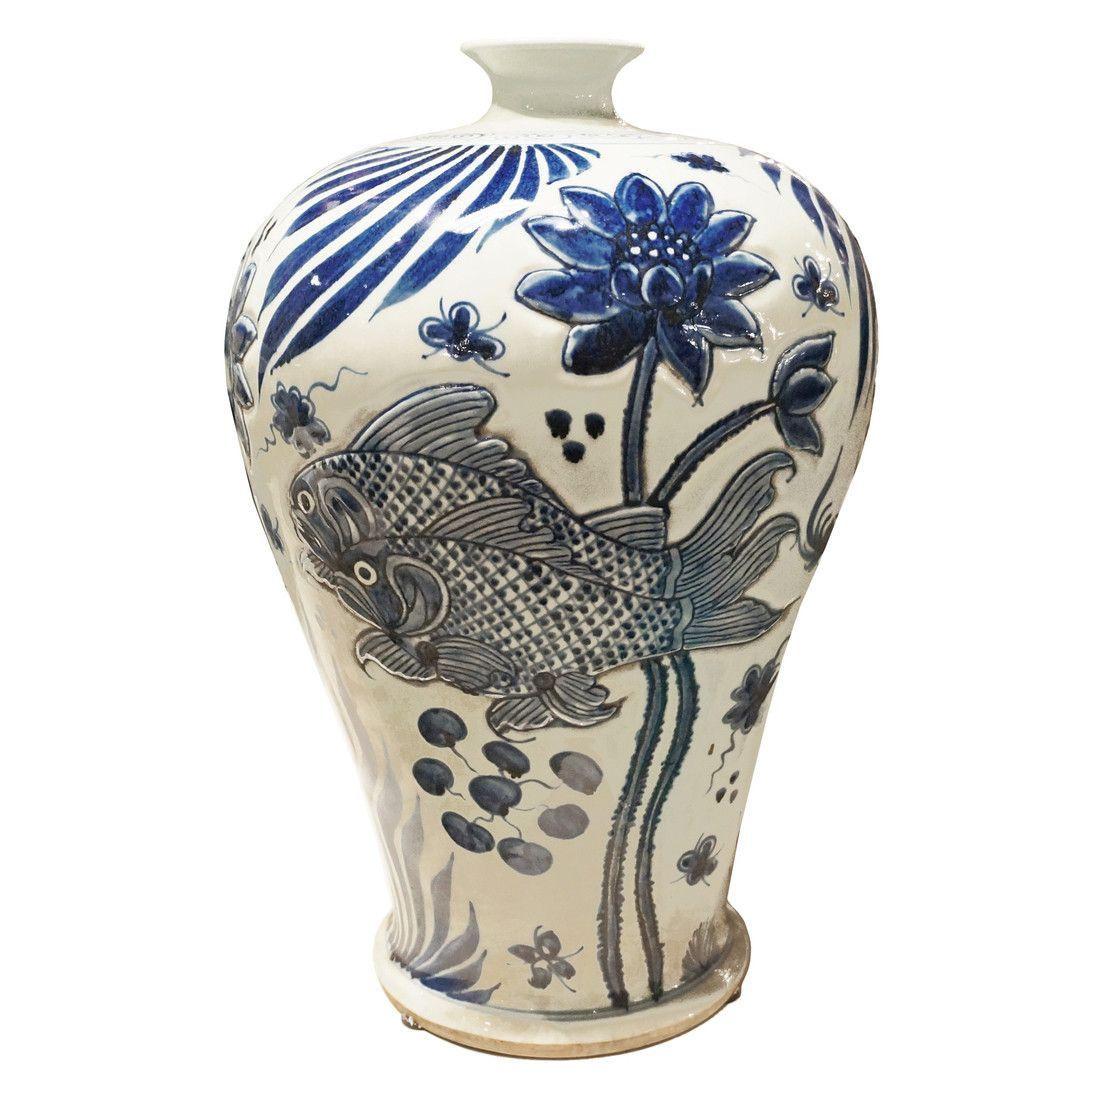 19 Wonderful White Urn Vase 2021 free download white urn vase of carved fish chinoiserie plum vase blue white products in carved fish chinoiserie plum vase blue white